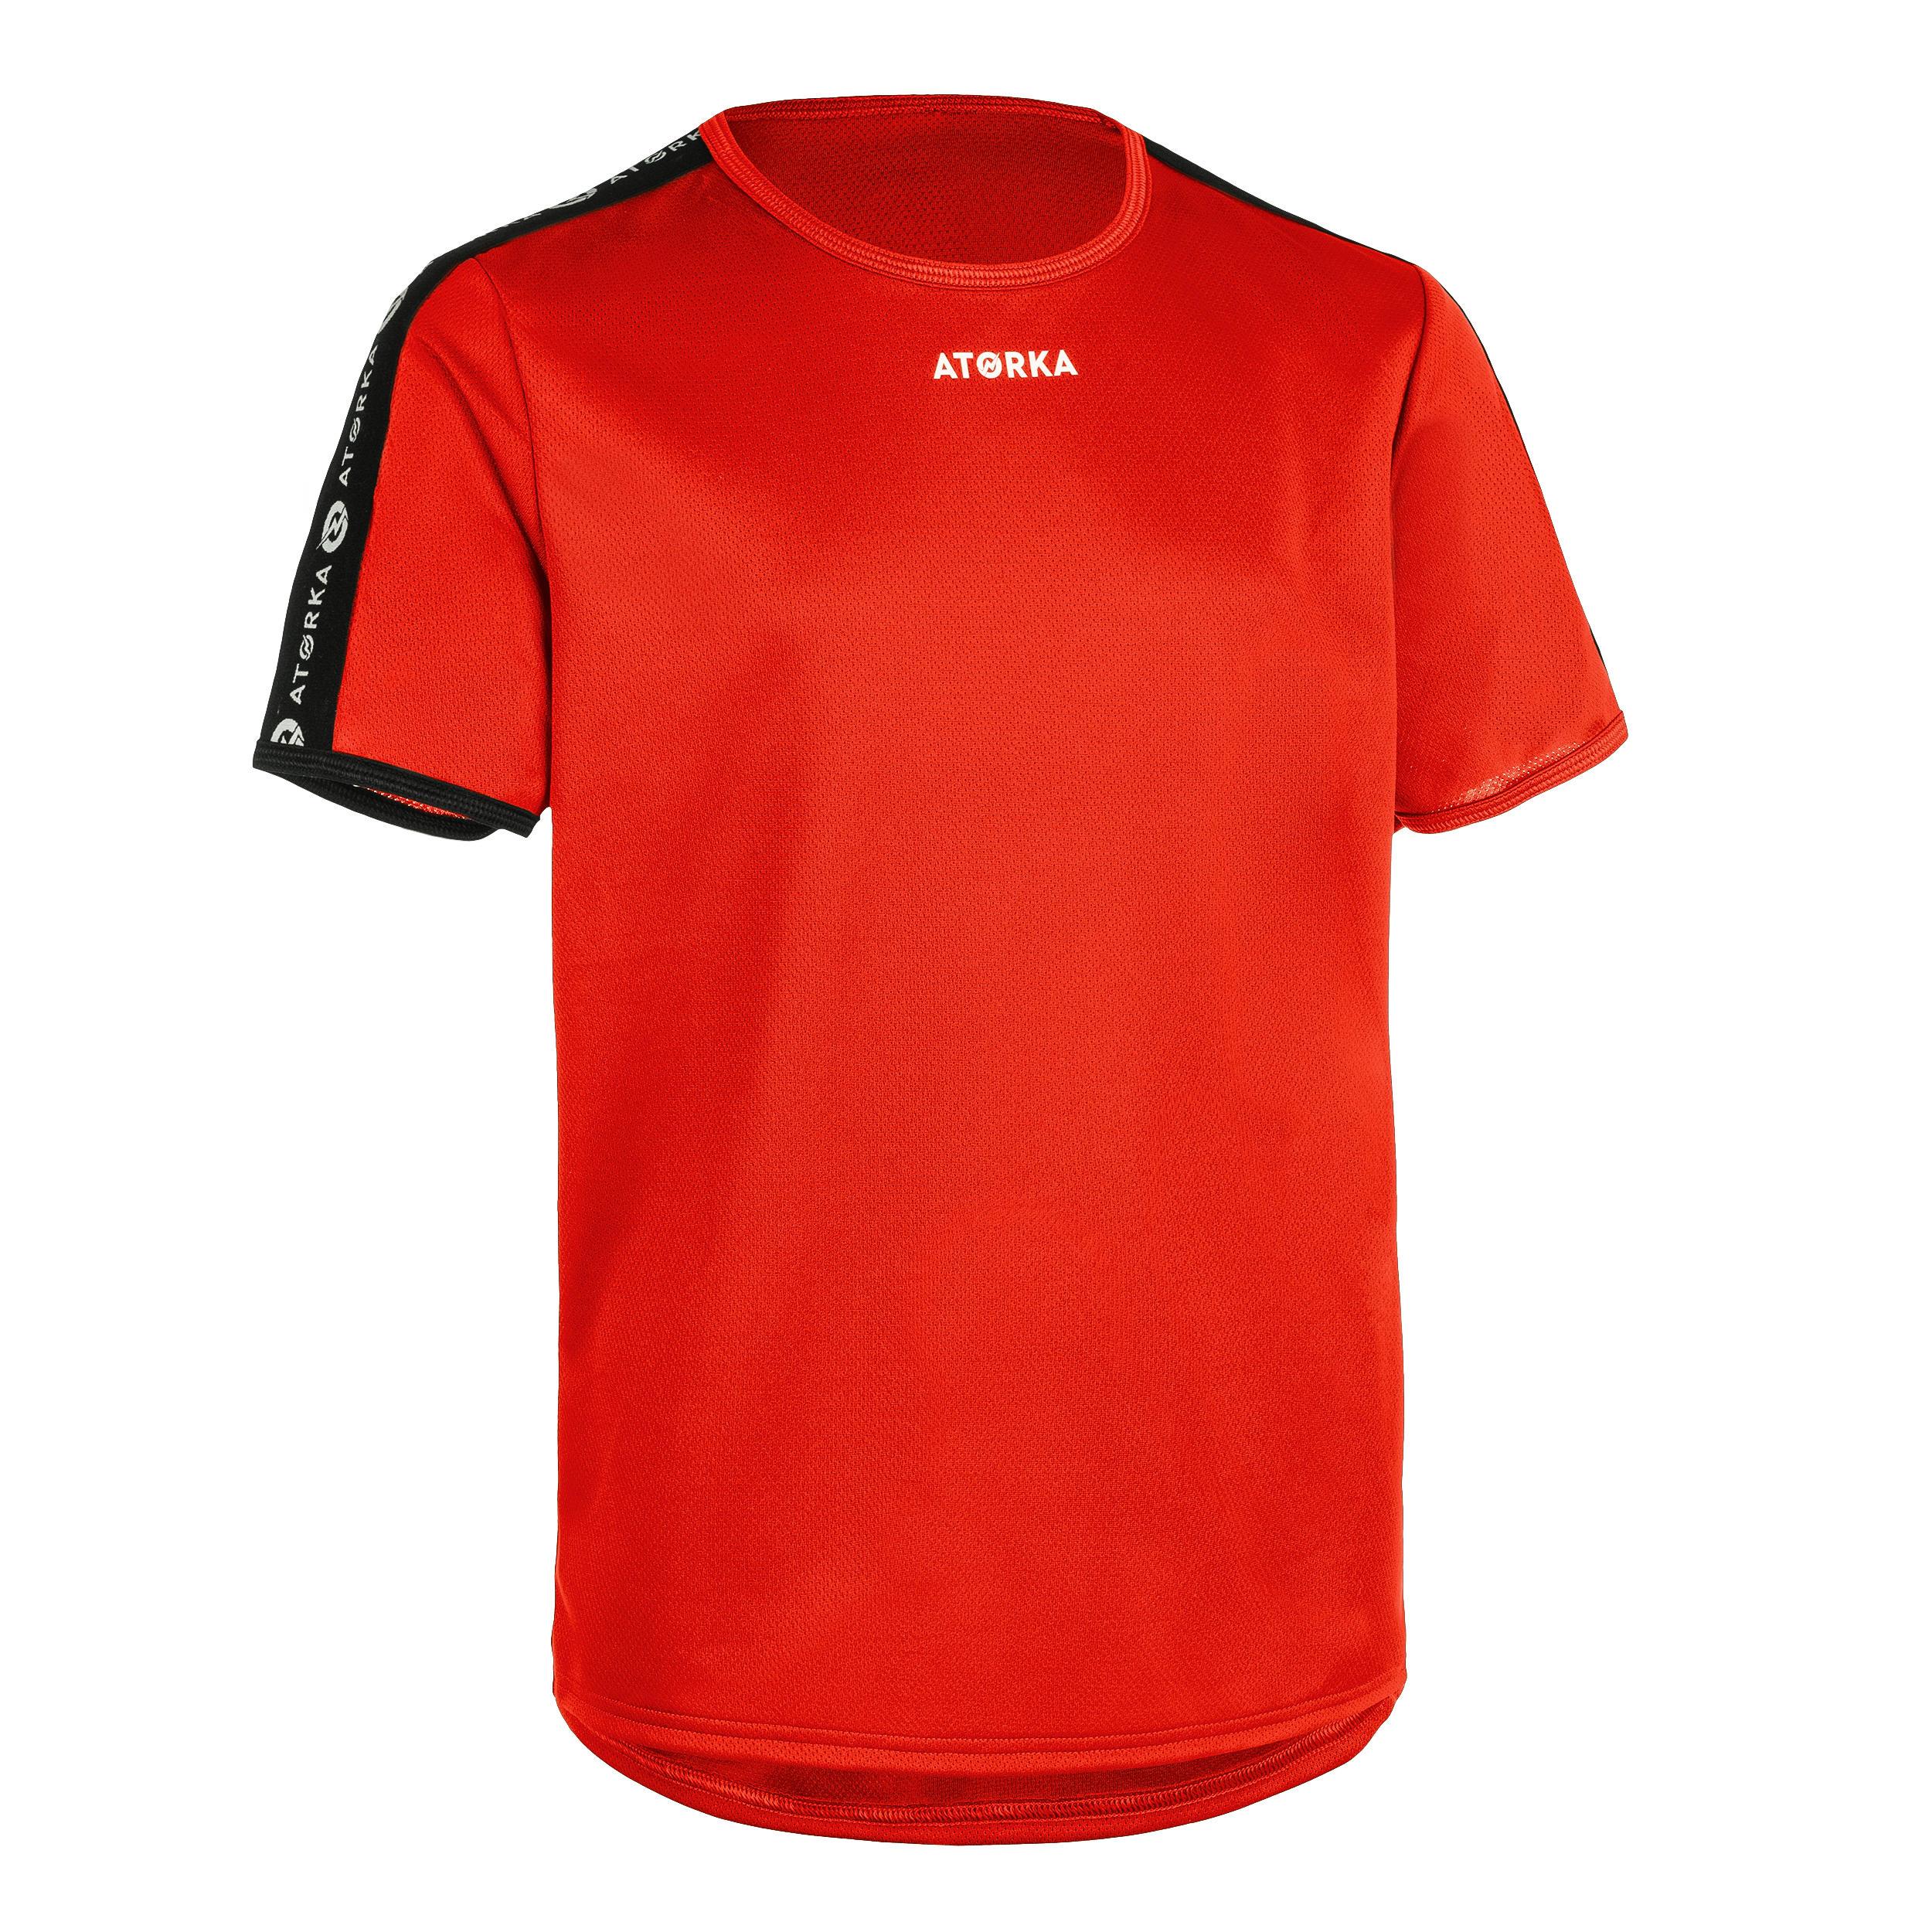 Tricou handbal H100 roșu copii la Reducere poza